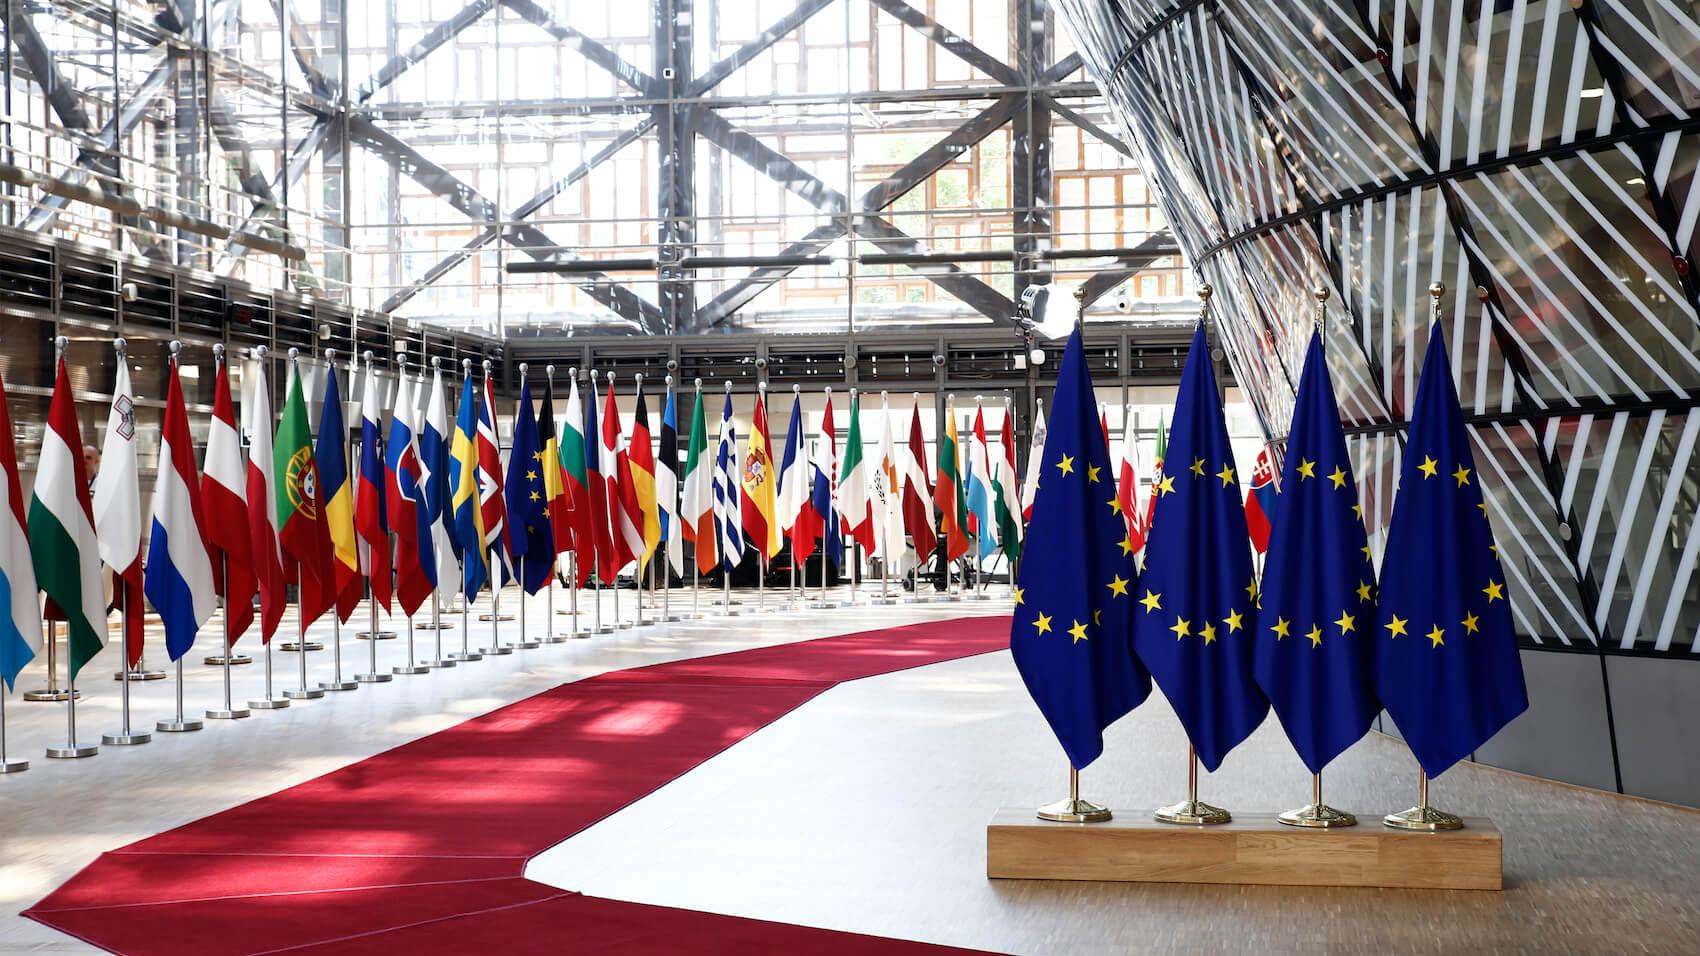 EU flags in EU Council building during an EU Summit in Brussels, Belgium on June 28, 2018. Photo: Alexandros Michailidis